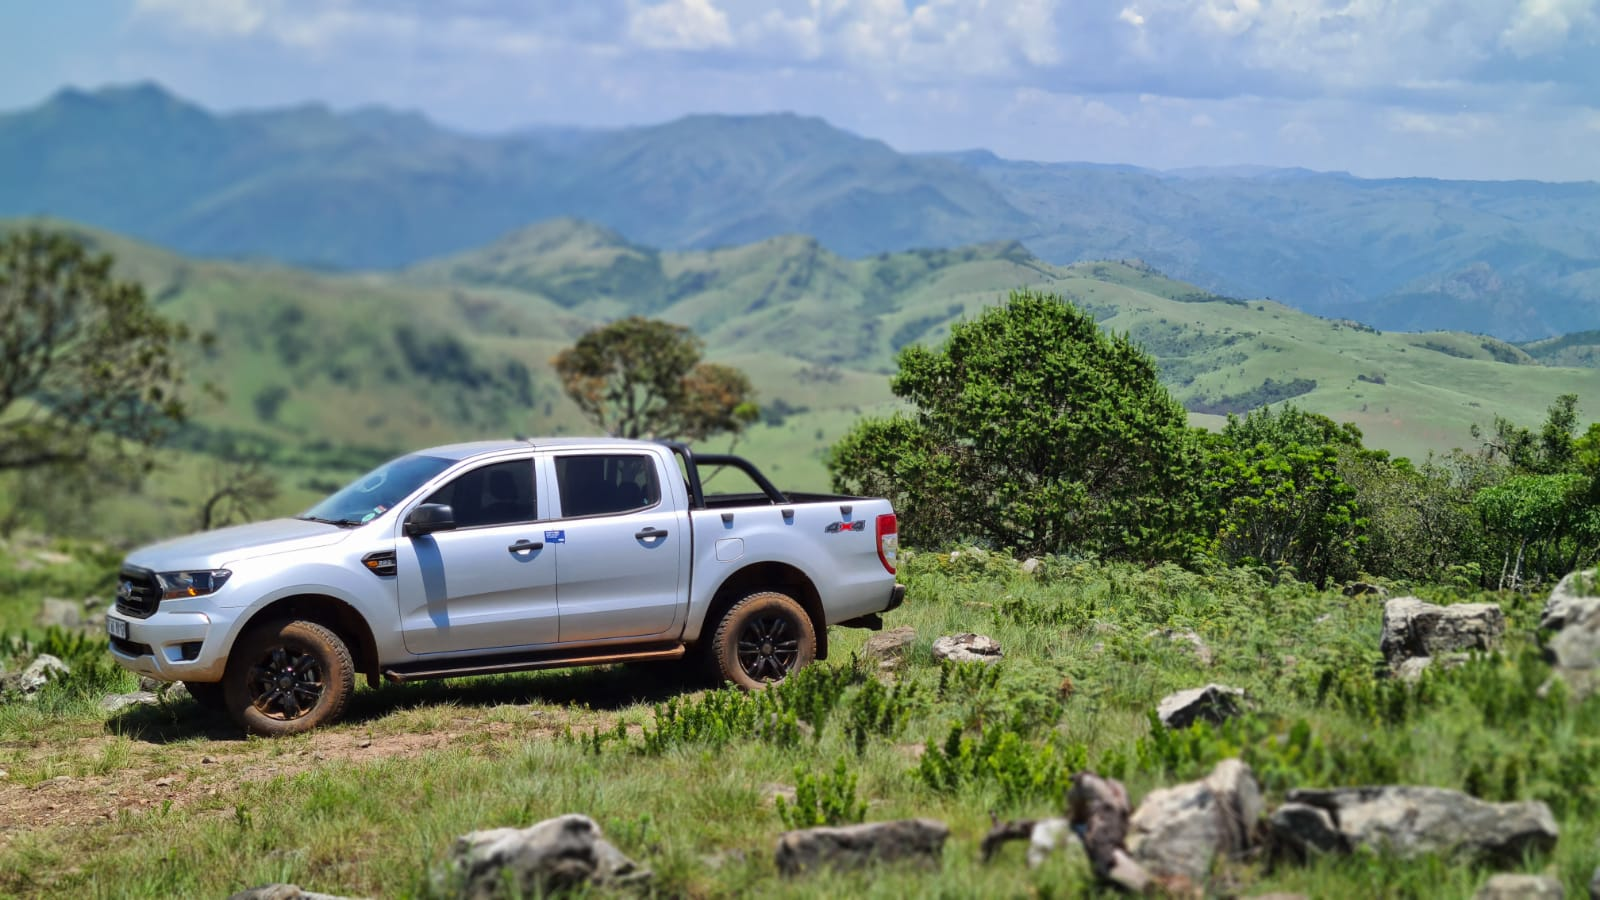 Ford Ranger XL Sport, not just a pretty face